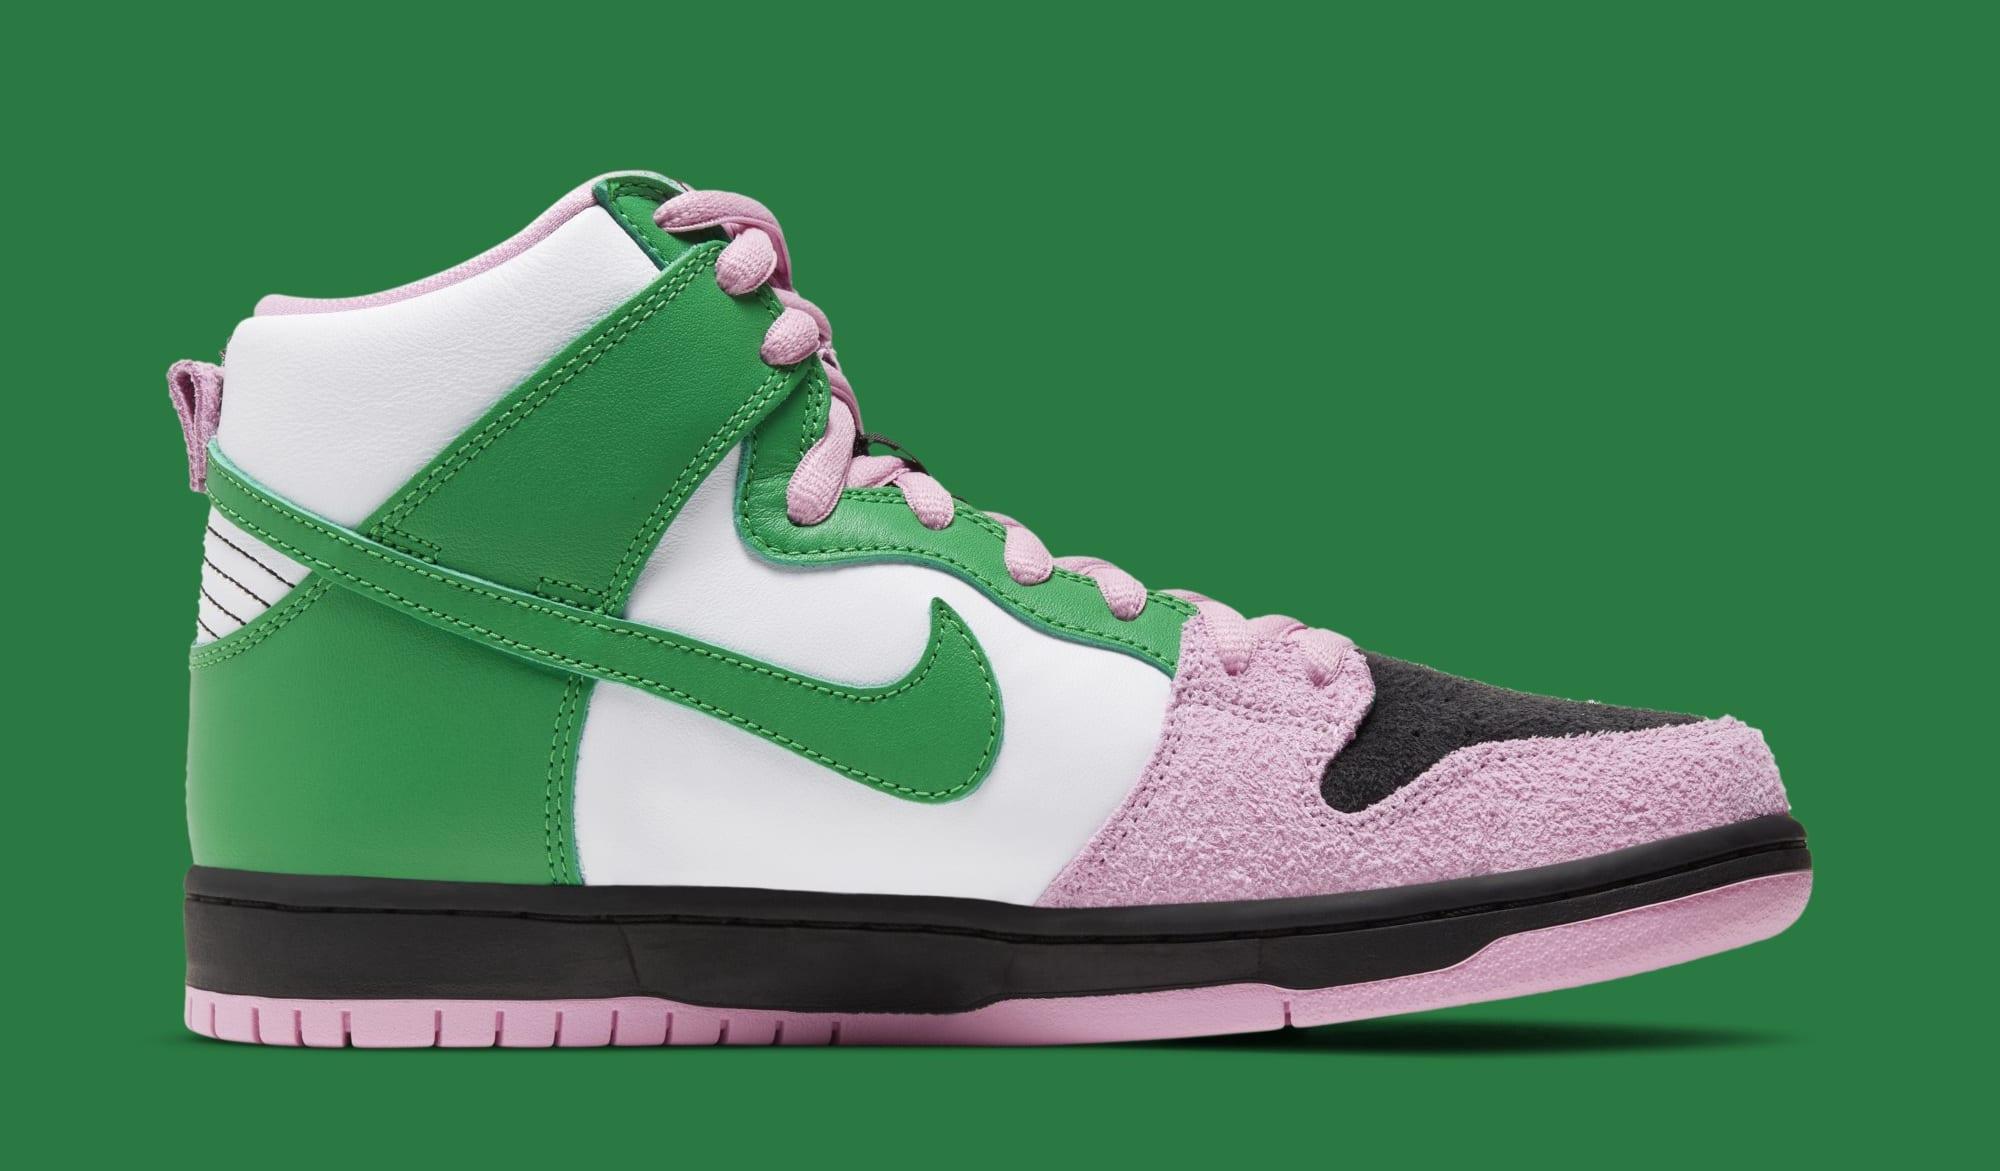 Nike SB Dunk High 'Invert Celtics' CU7349-001 Medial